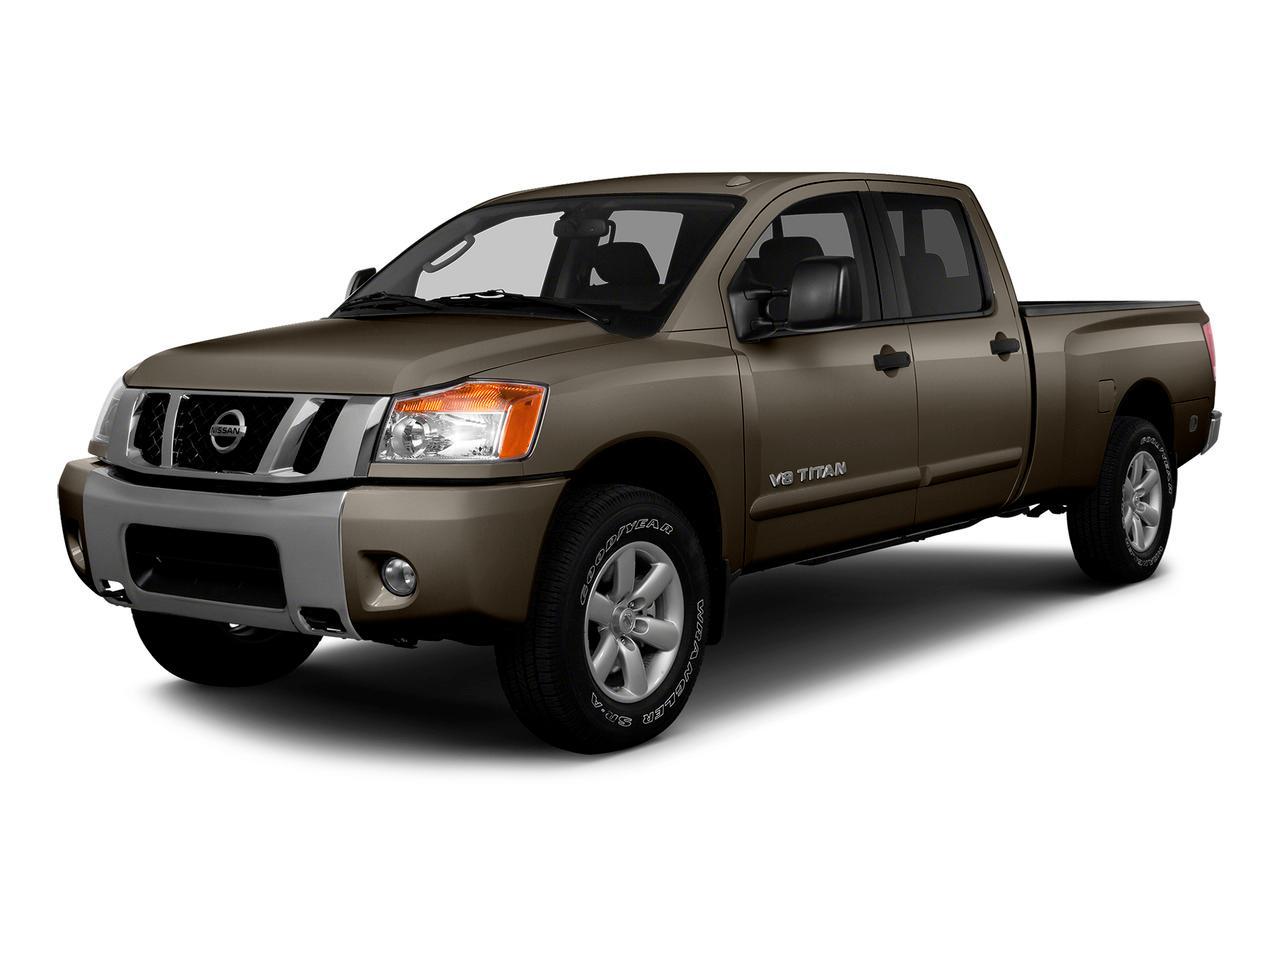 2015 Nissan Titan Vehicle Photo in San Antonio, TX 78209